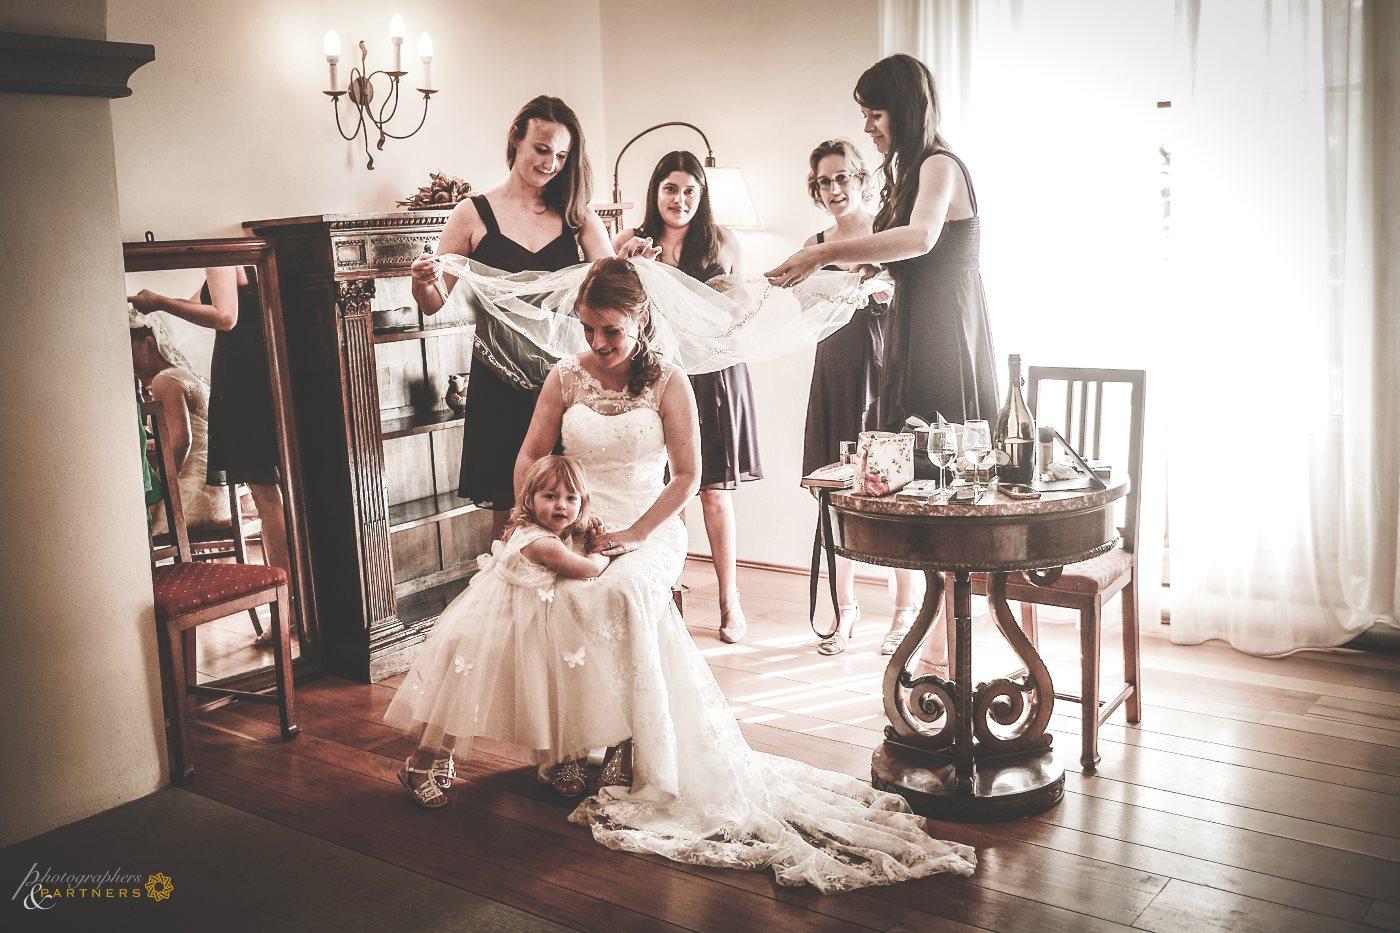 wedding_photos_sticciano_05.jpg